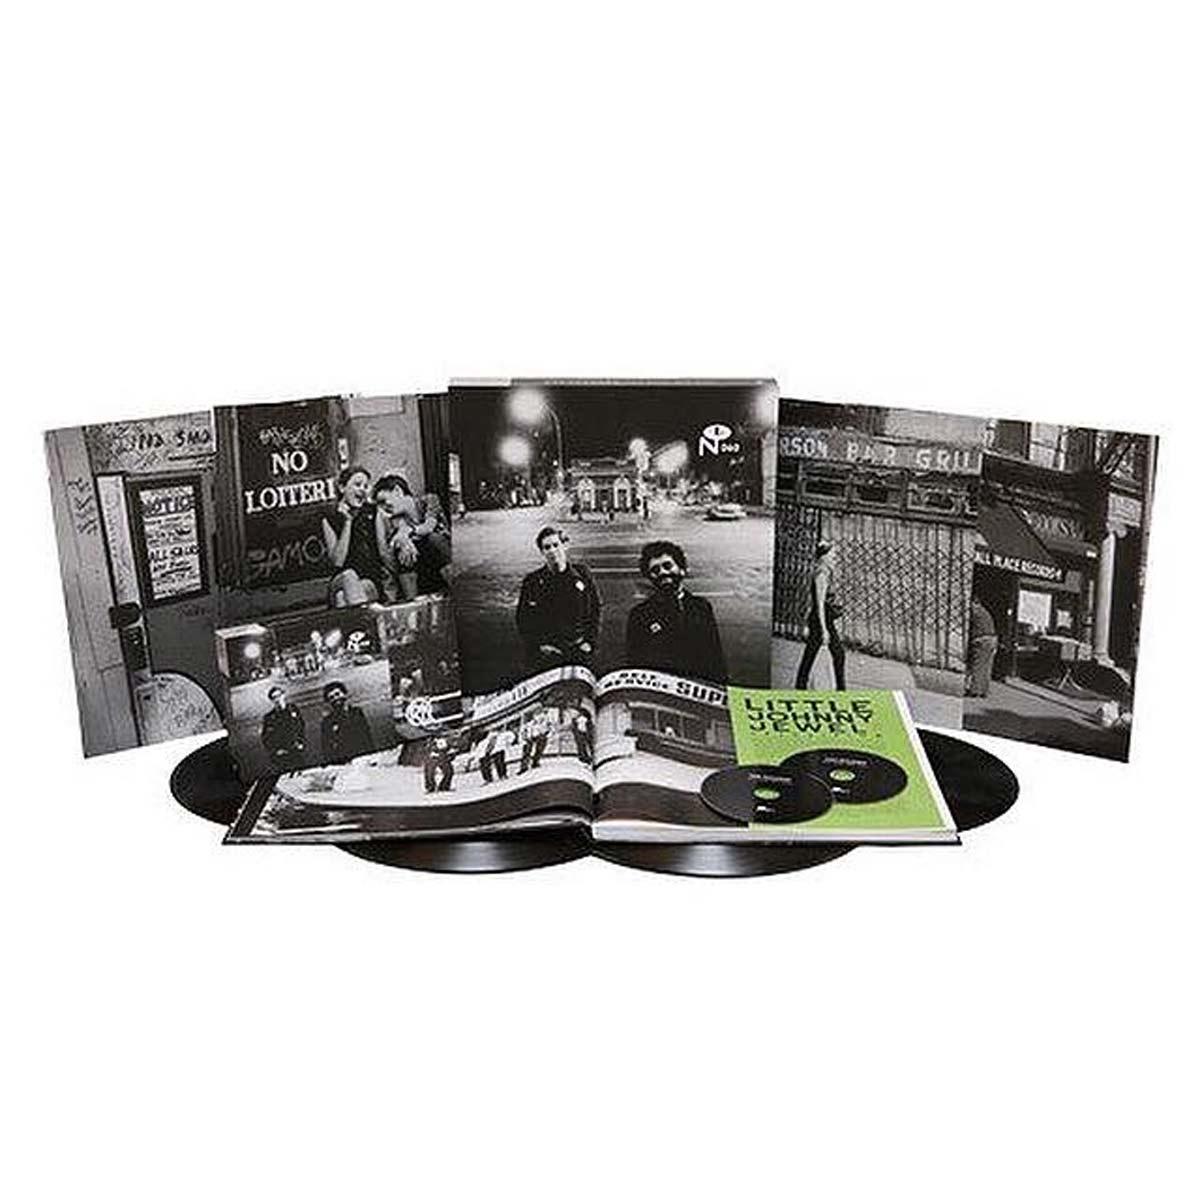 AA.VV. Ork Records: New York, New York